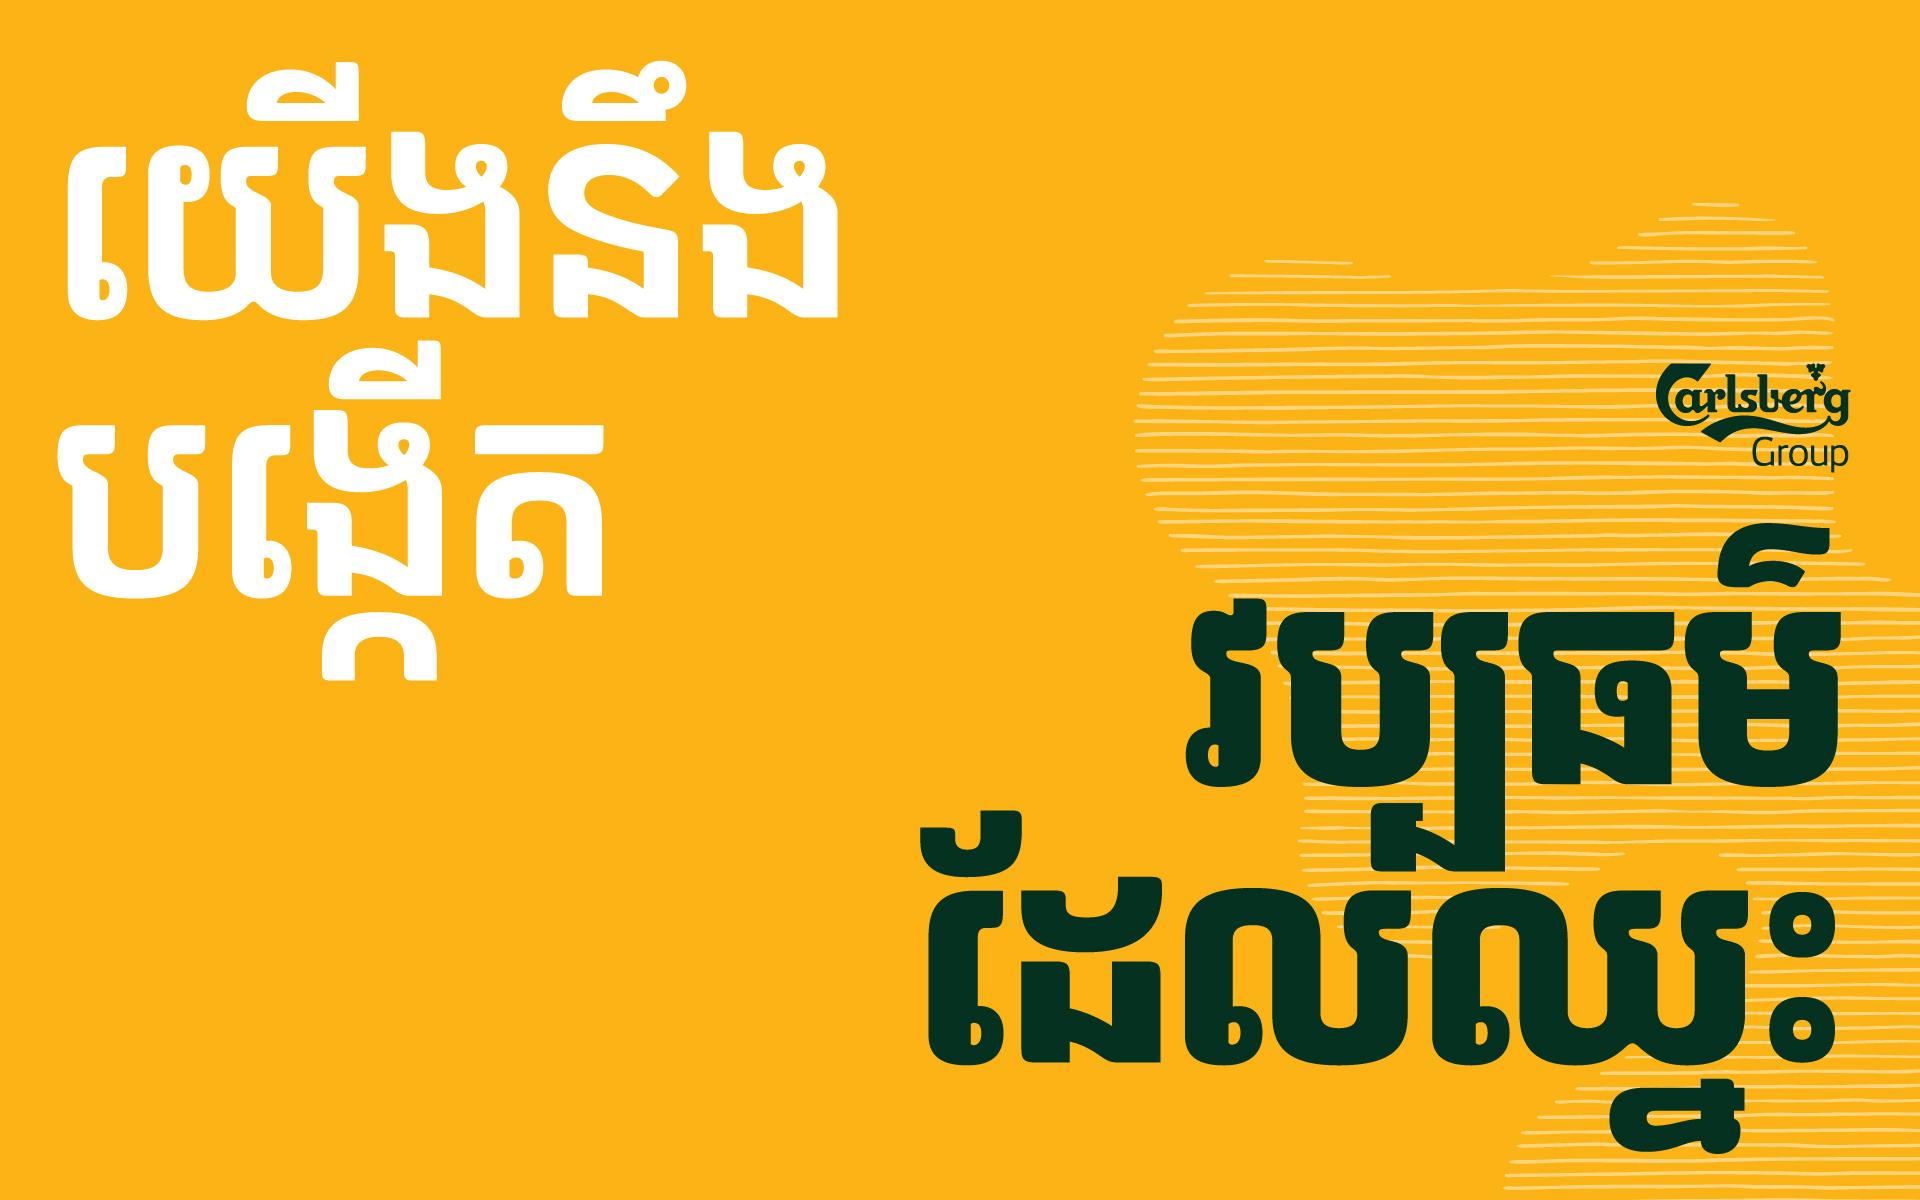 Carlsberg-Sans-Type-Design-9